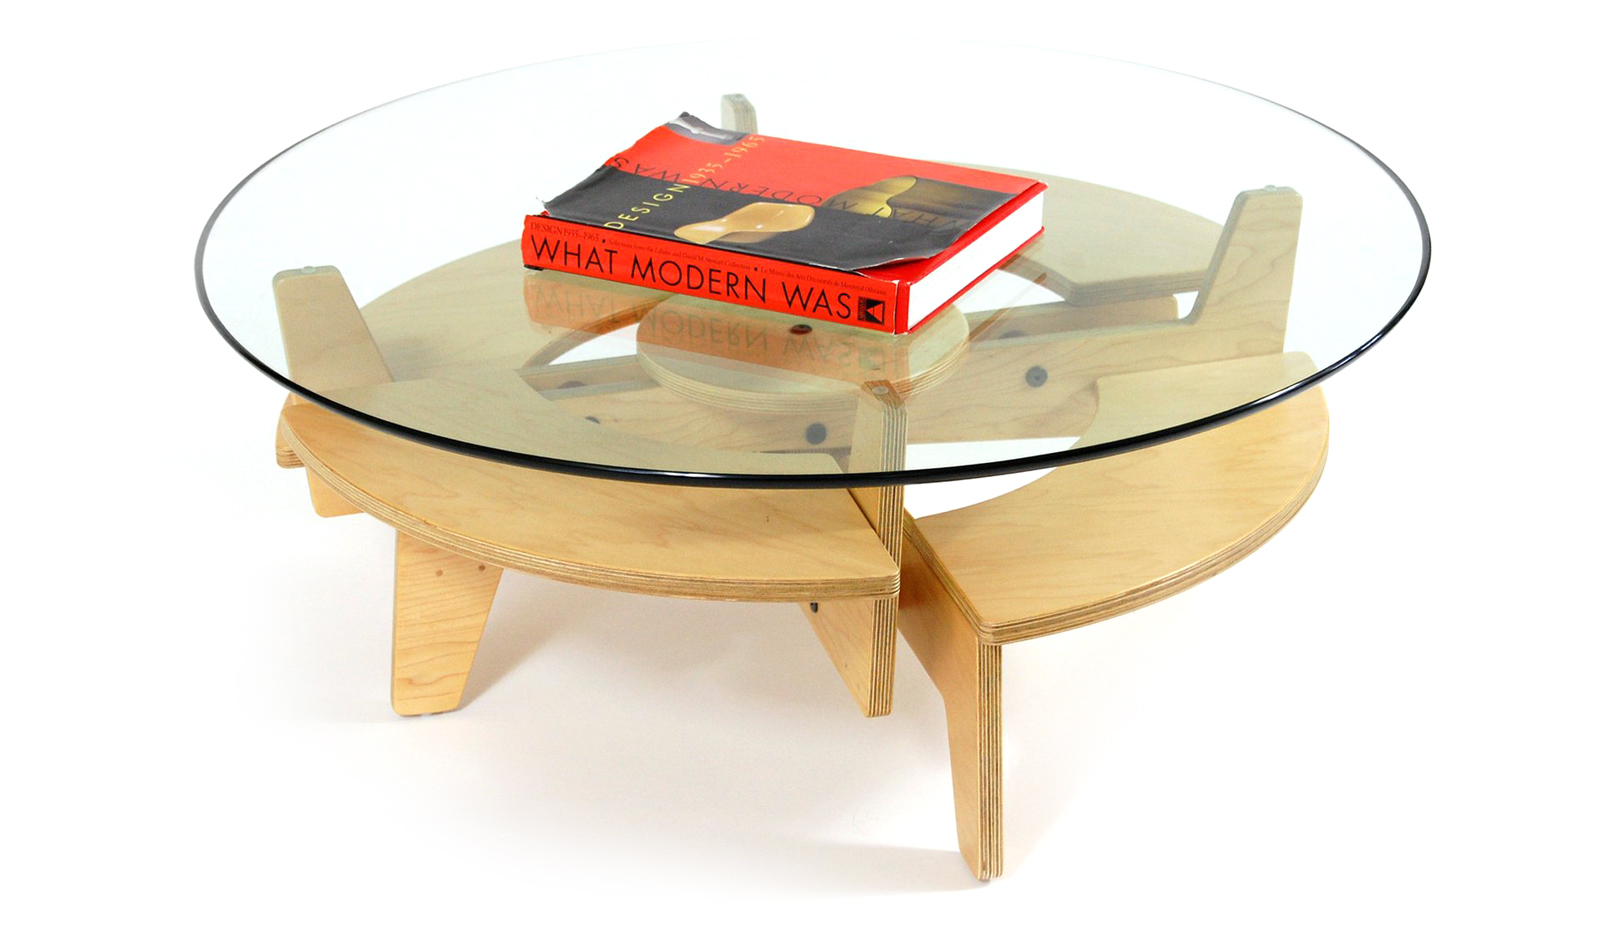 atlas-coffee-table-with-book-slice-furniture.jpg